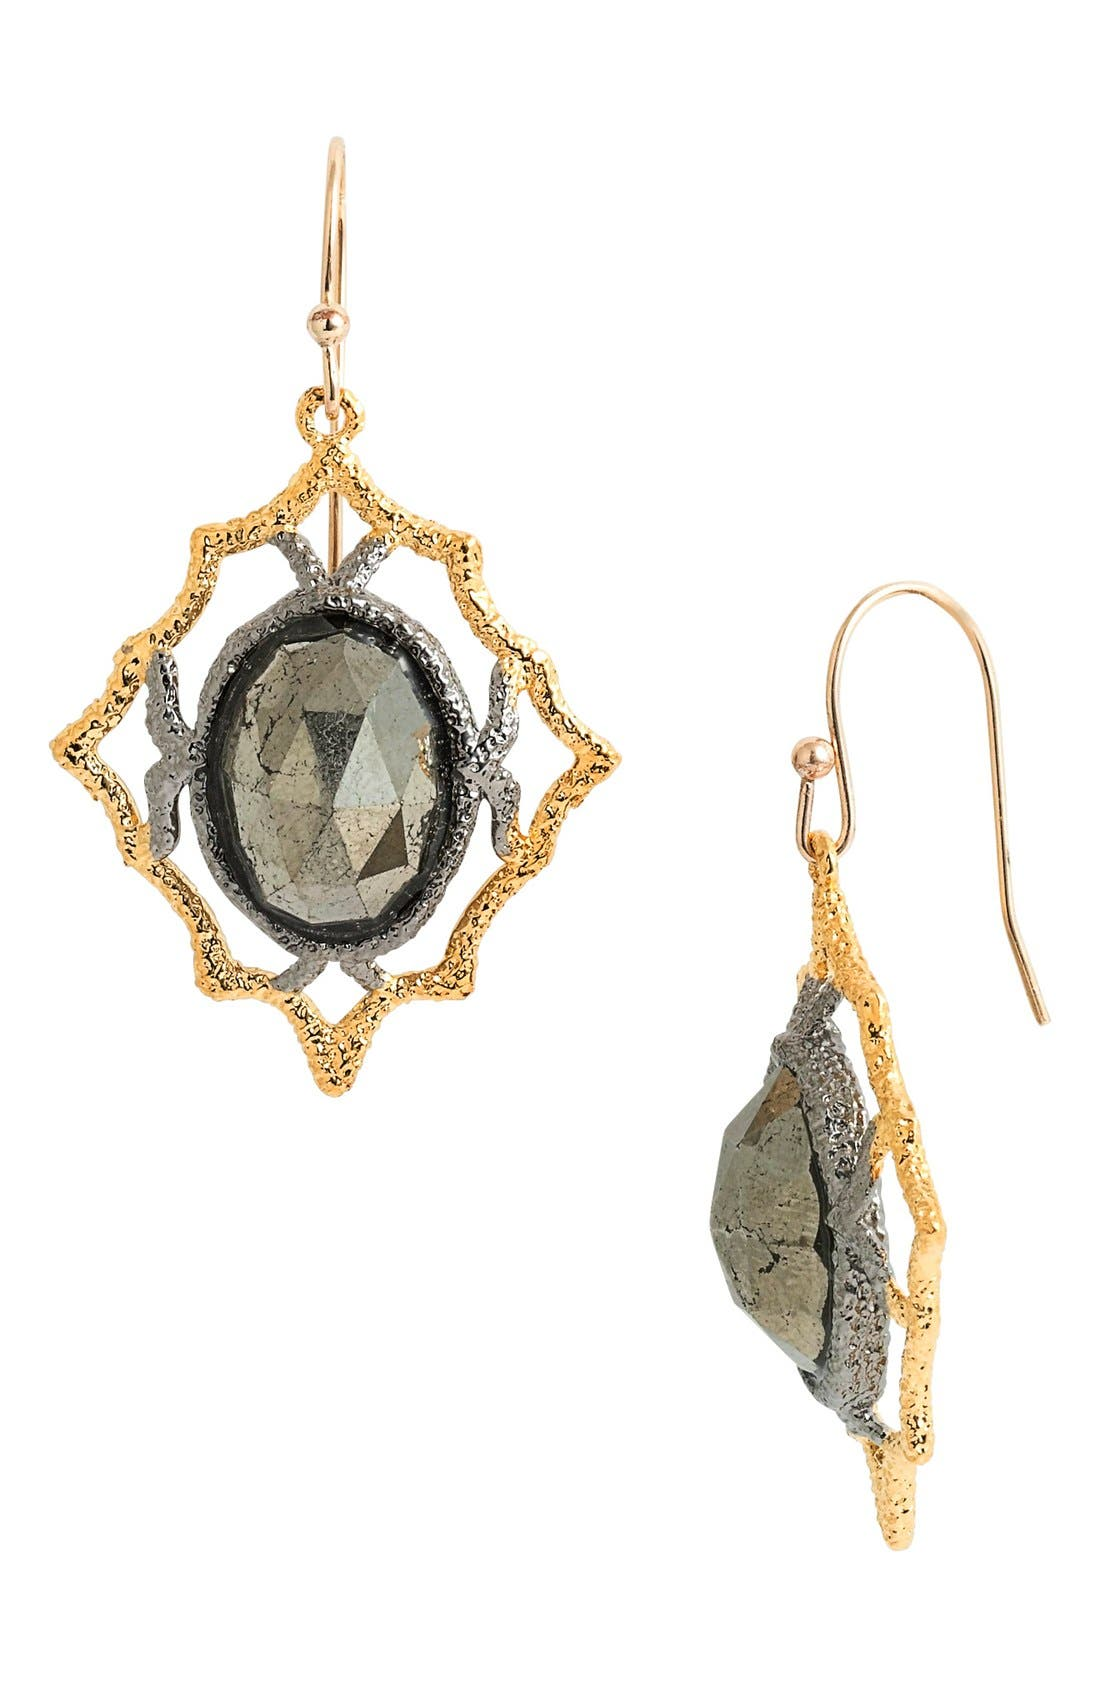 Main Image - Alexis Bittar 'Elements - Jardin de Papillon' Drop Earrings